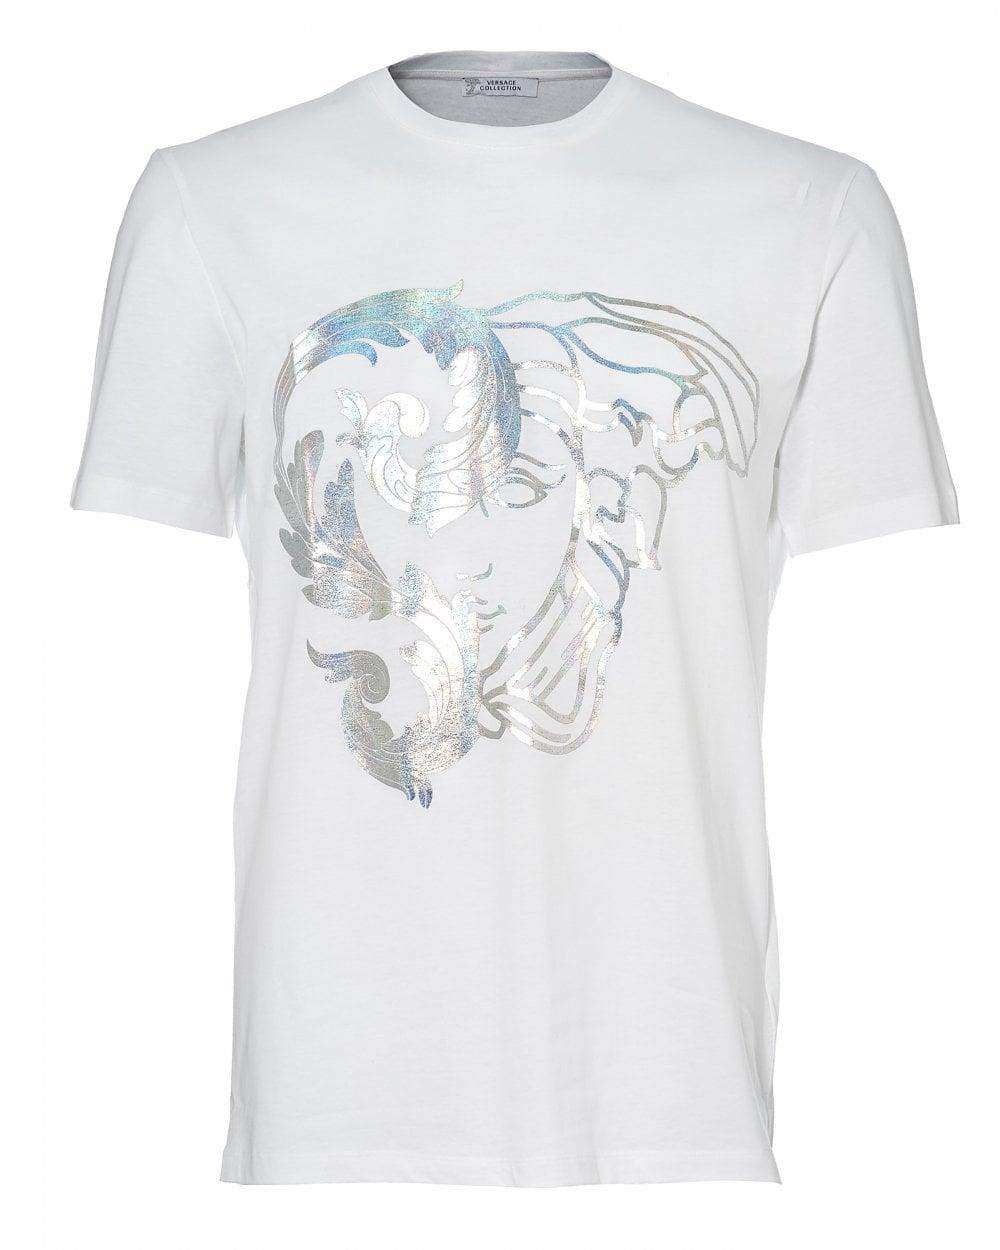 Versace Men/'s T-shirt Black